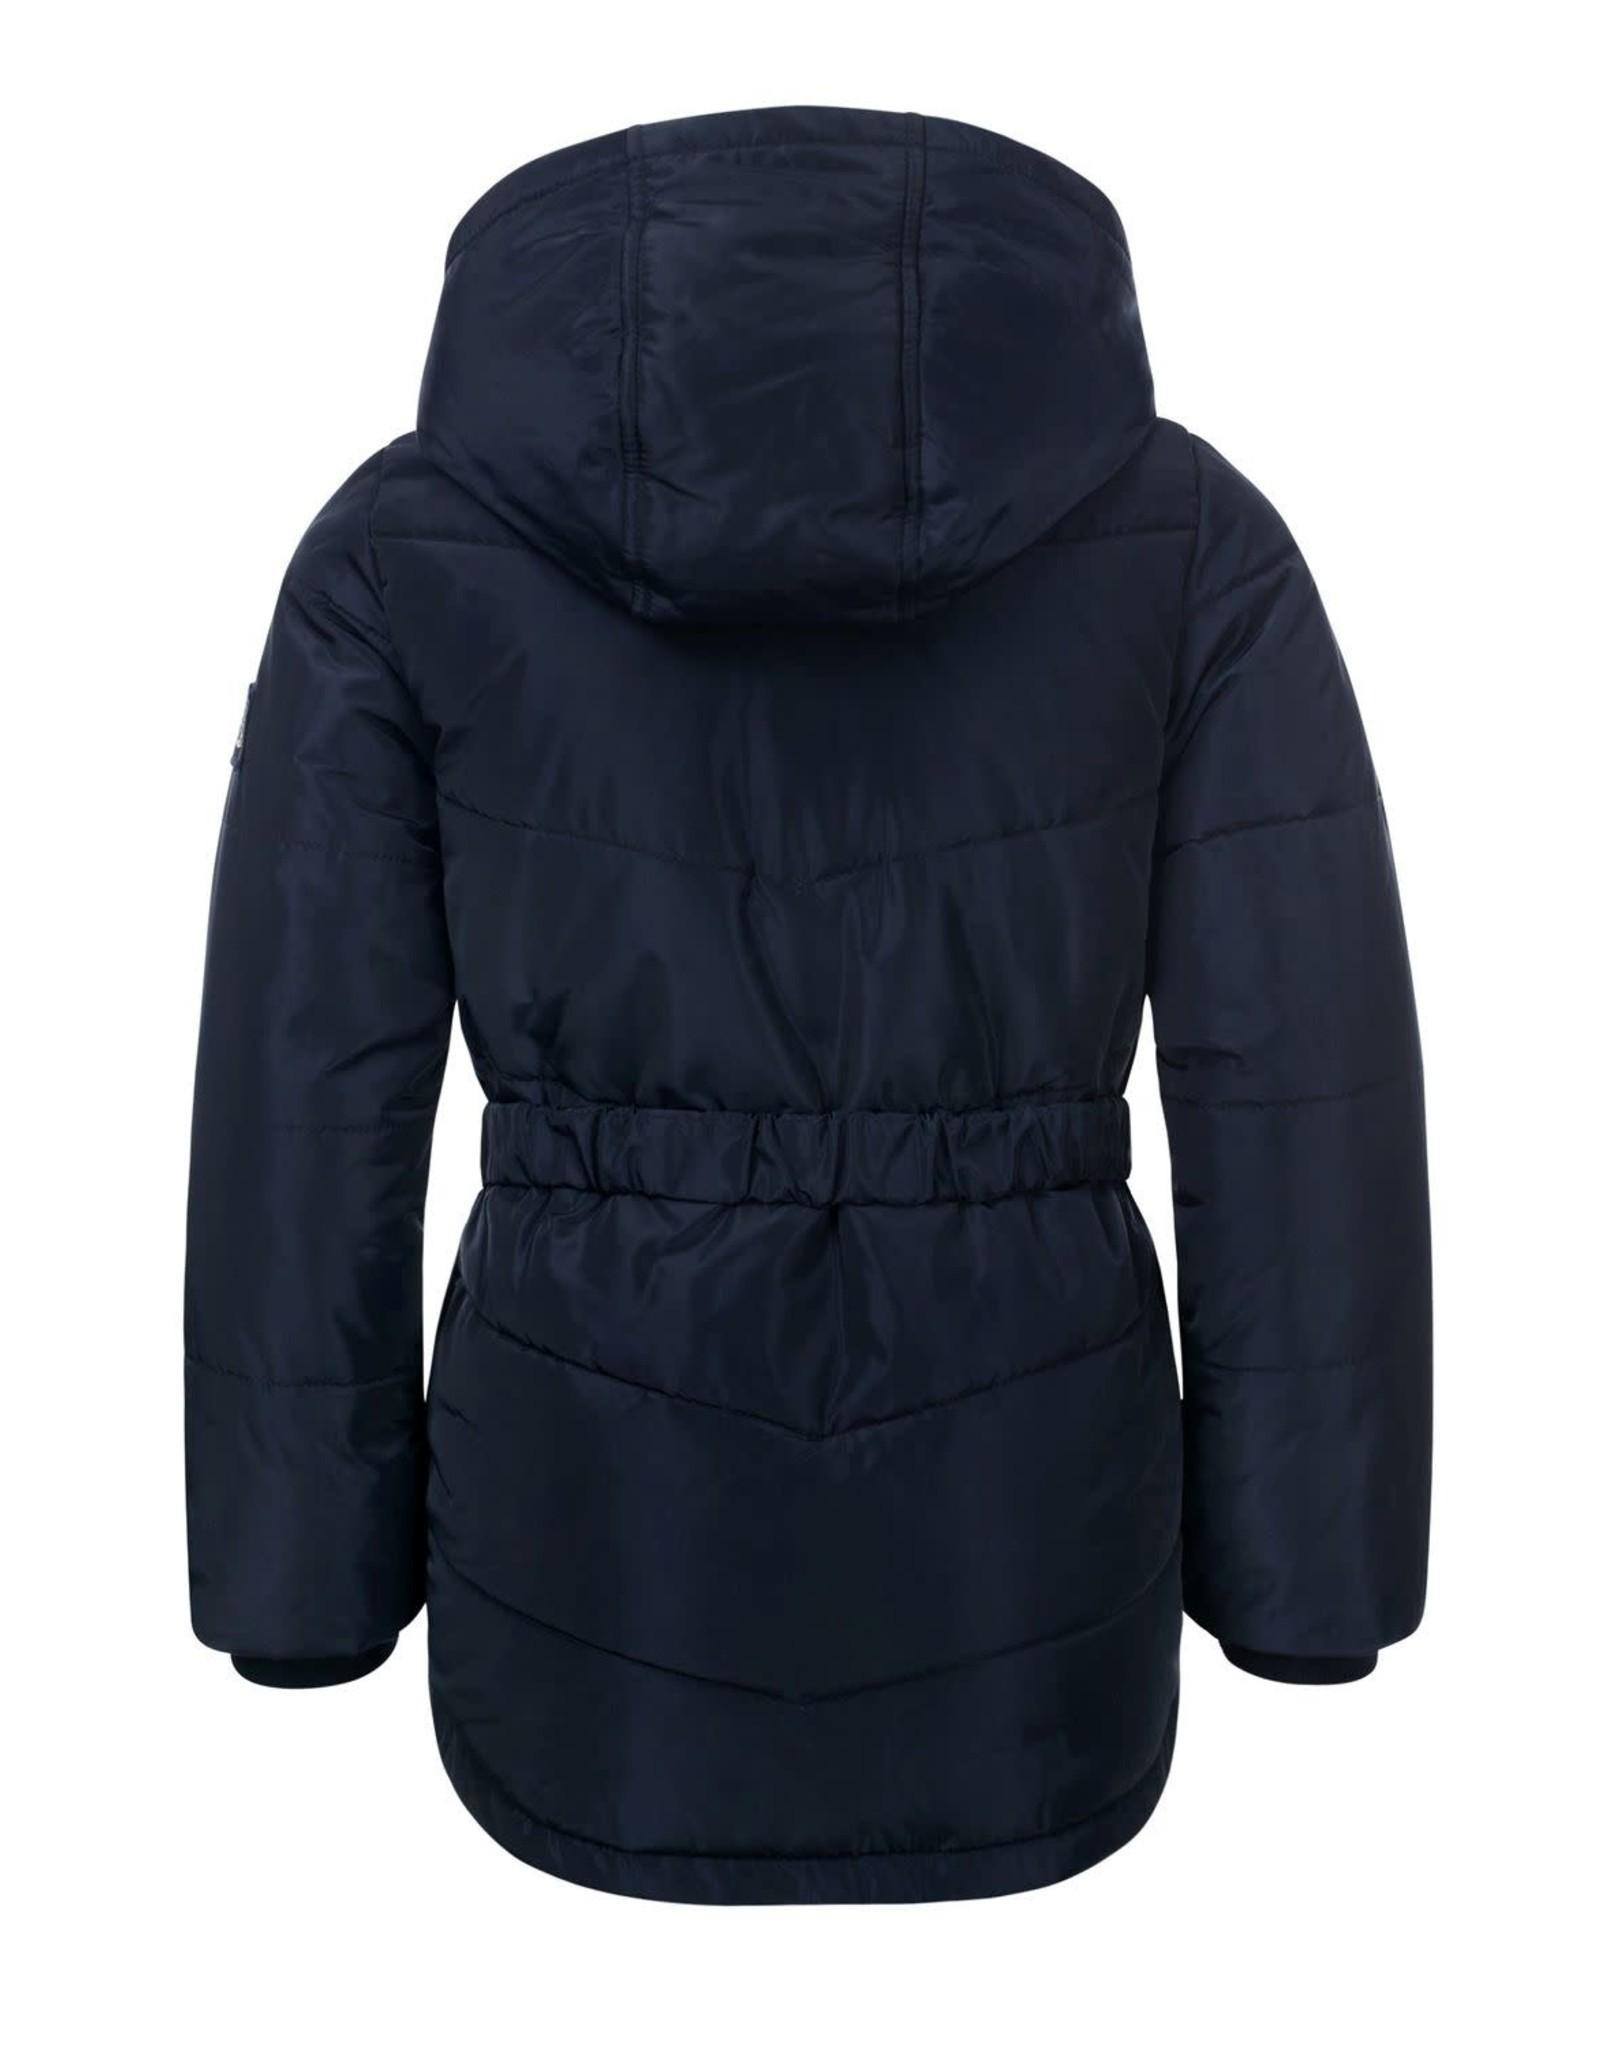 Looxs Girls Parka outerwear jacket Midnight